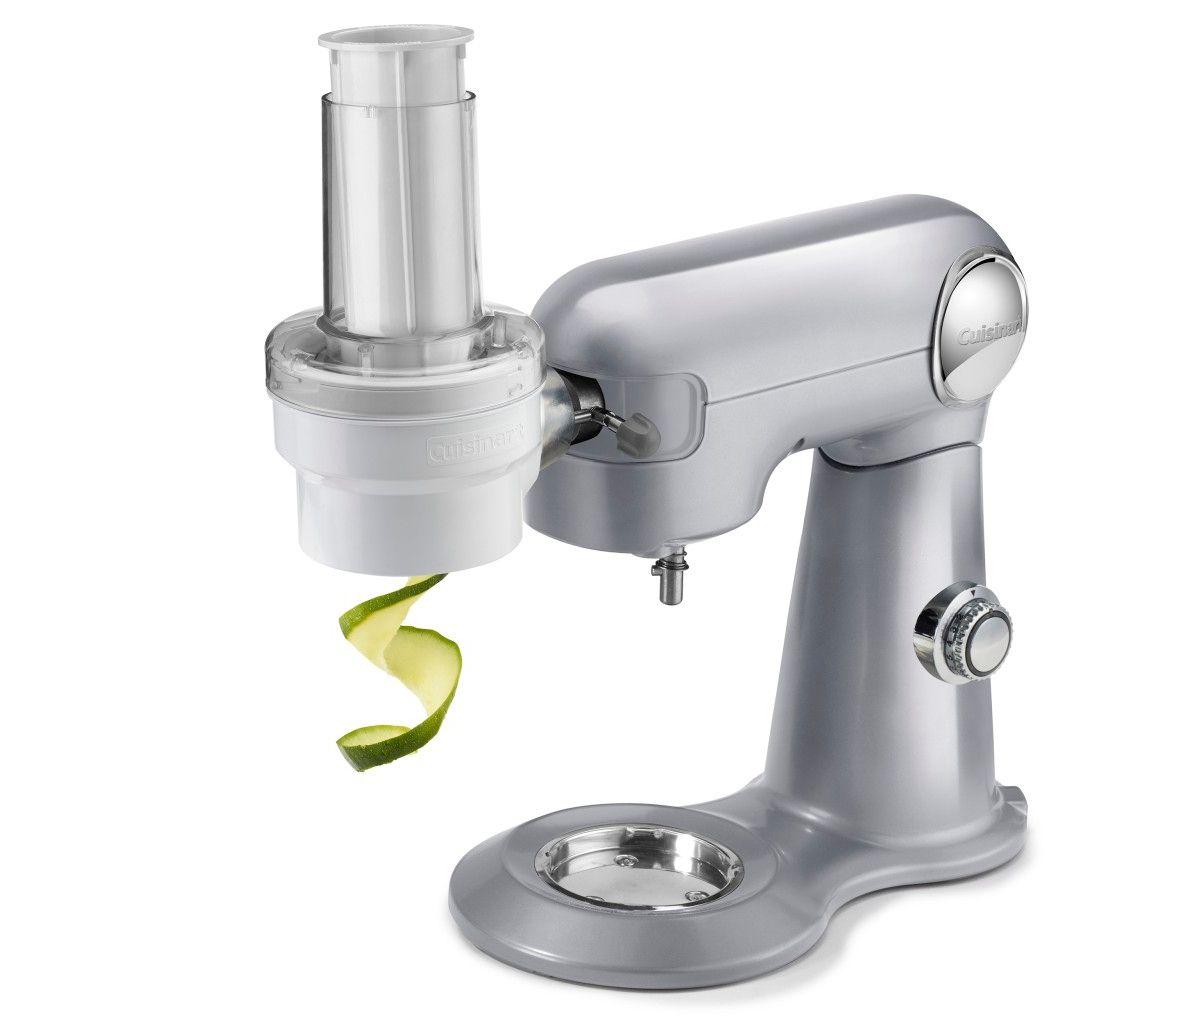 Cuisinart spi50 prepexpress spiralizerslicer attachment